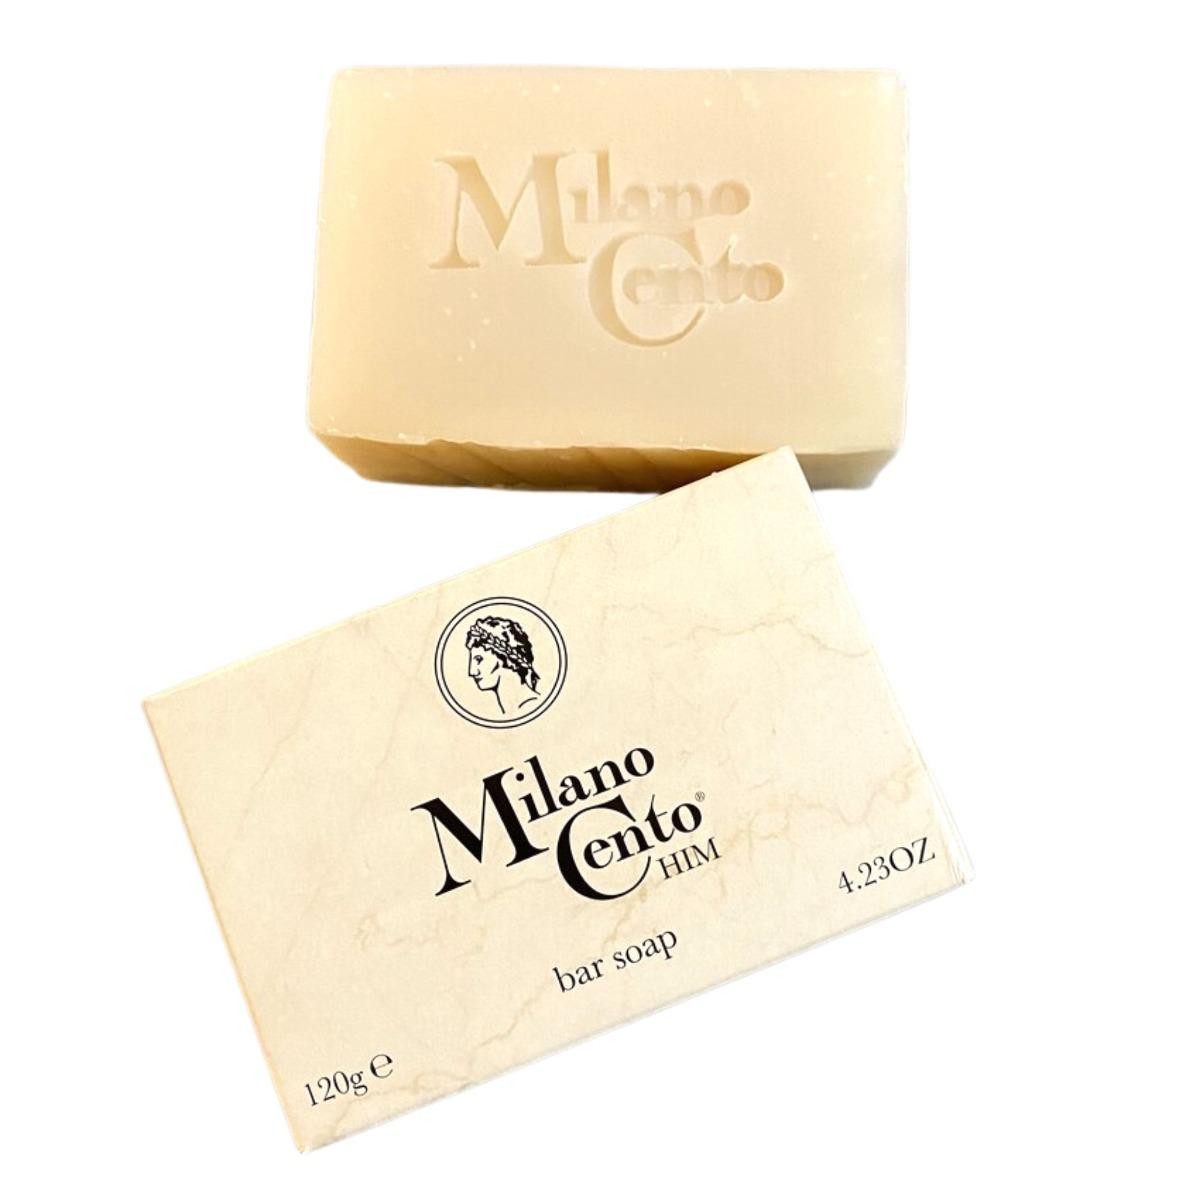 Milano Cento 120g Soap Bar